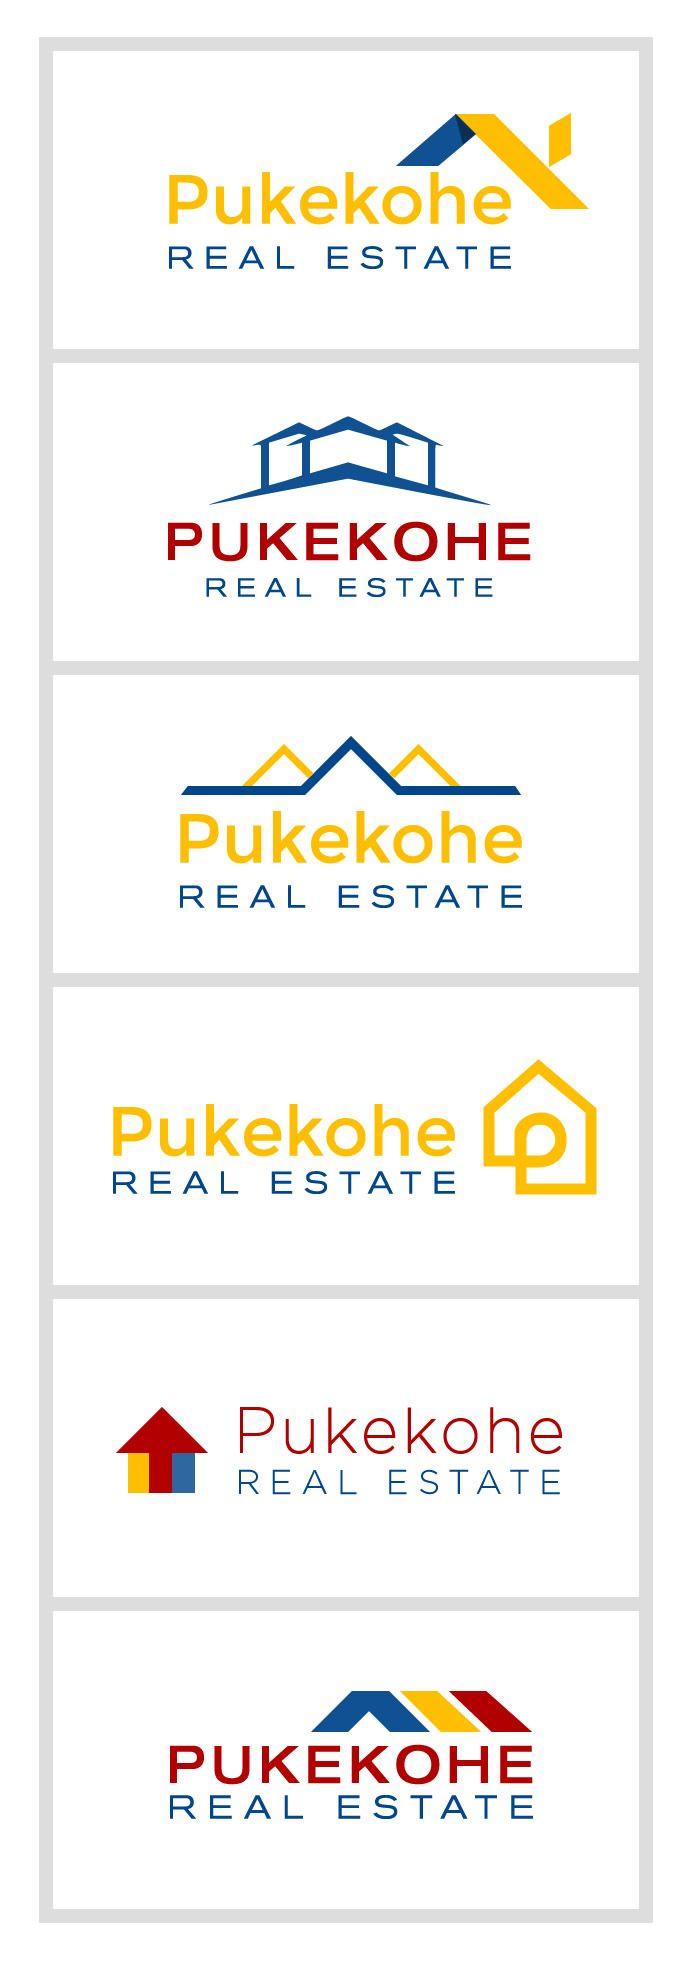 Pukekohe Real Estate